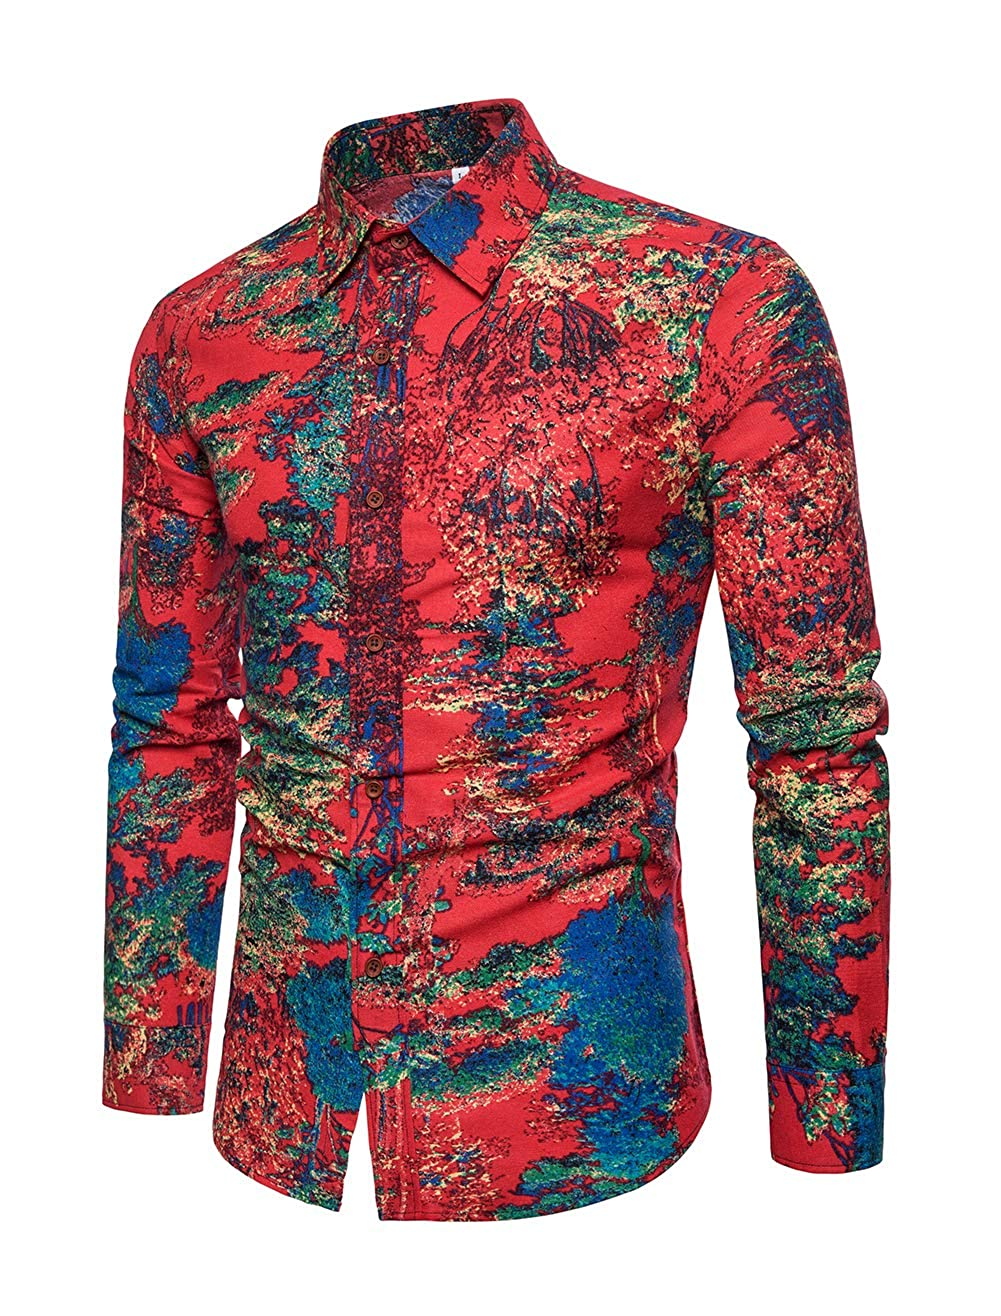 INVACHI Mens Casual Button Down Print Linen Shirts Long Sleeve Slim Fit Floral Shirt